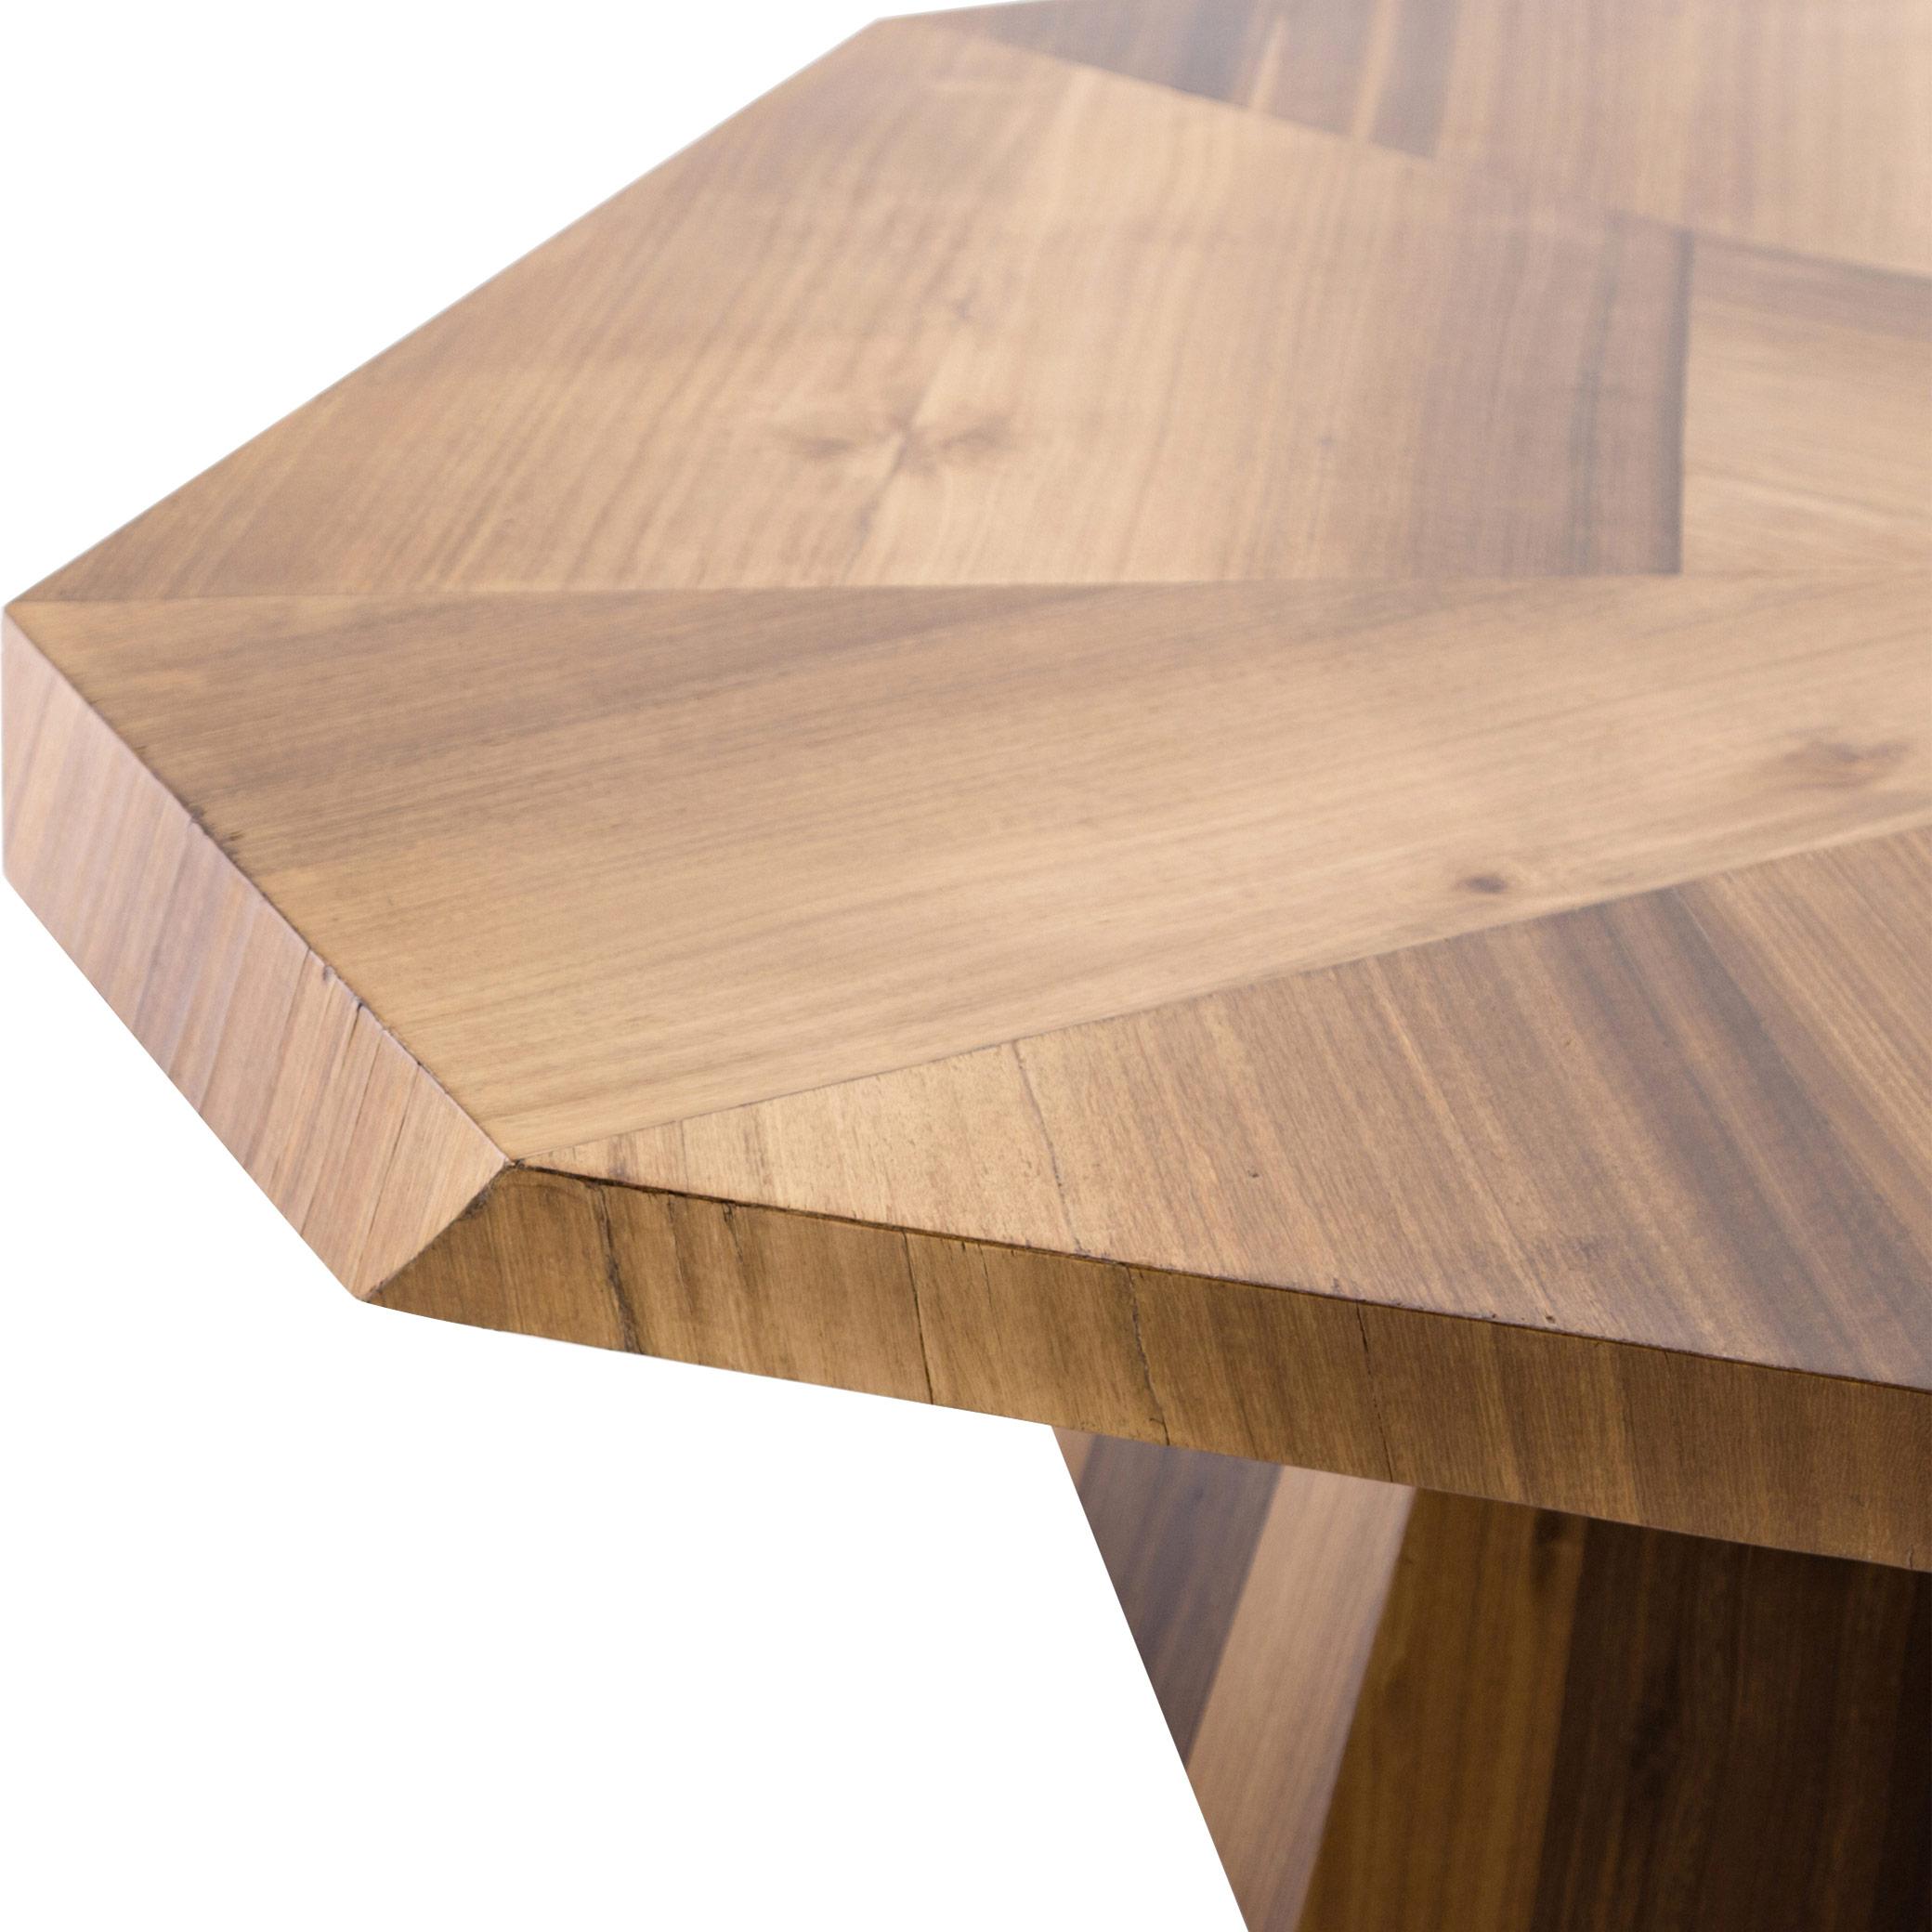 Colt Modern Geometric Blonde Yukas Wood Pedestal Coffee Table RESTOCK Mid September 2021